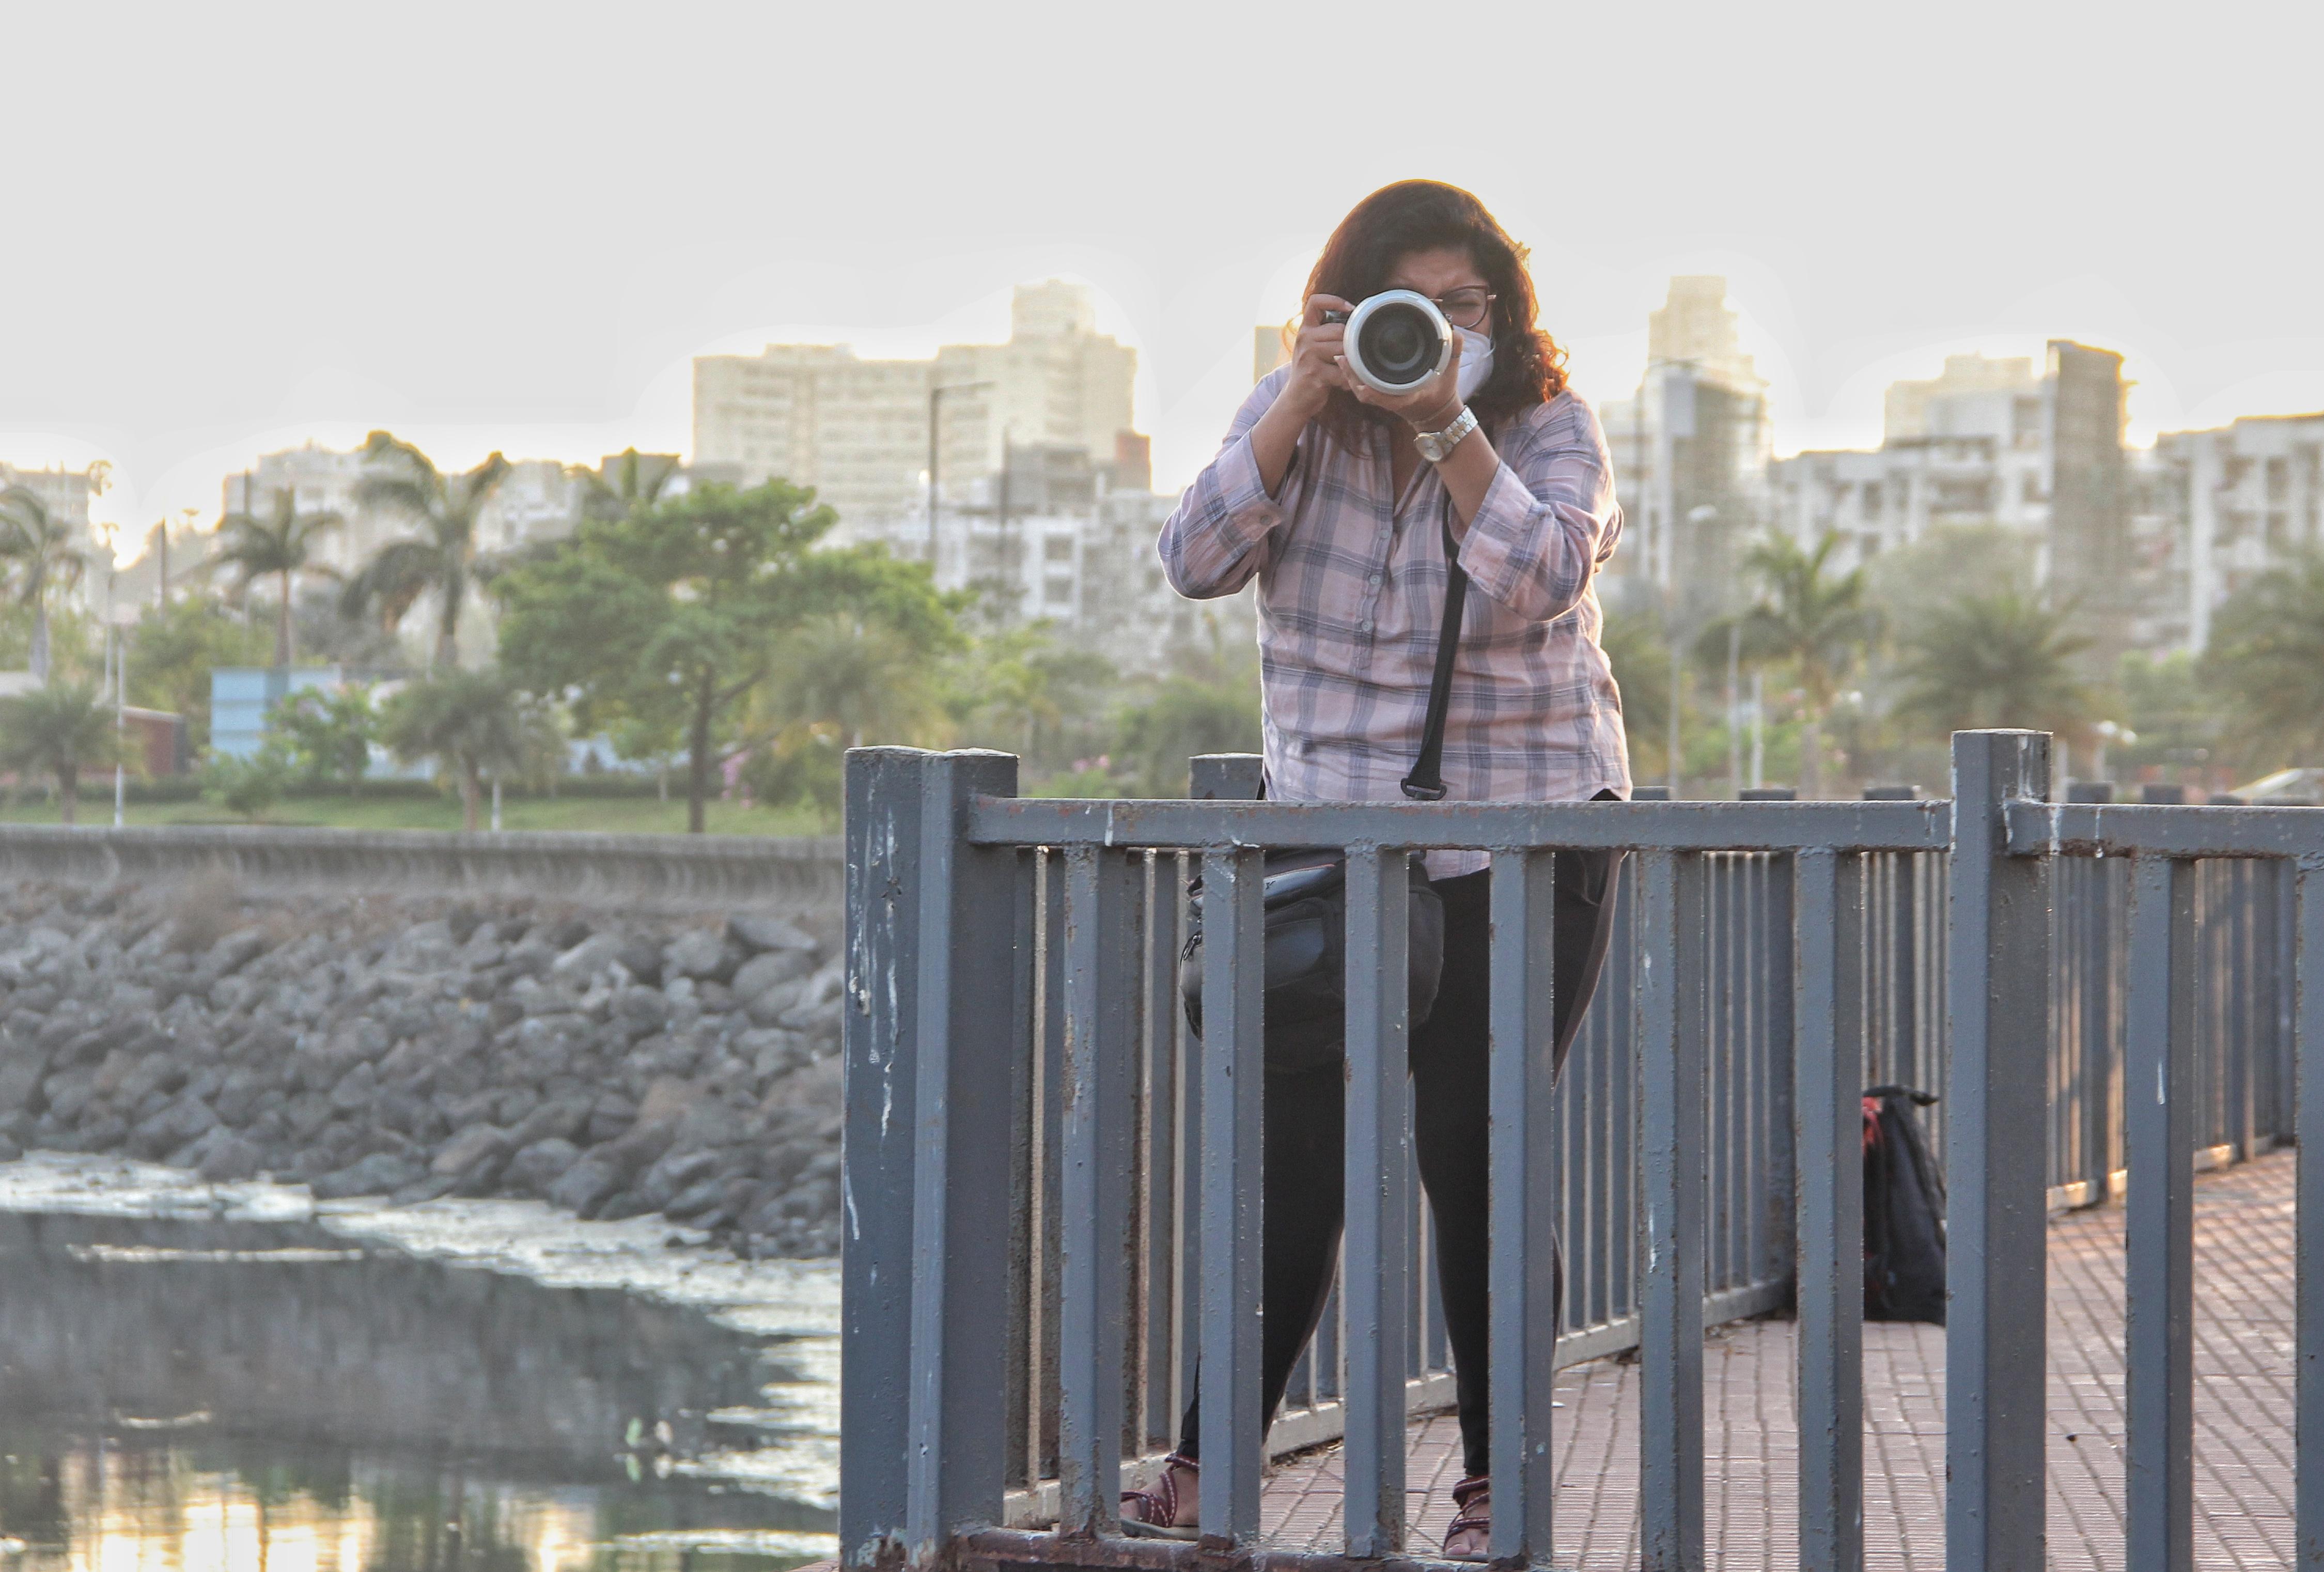 Photojournalist Hemanshi Kamashi on intimate hygiene kit